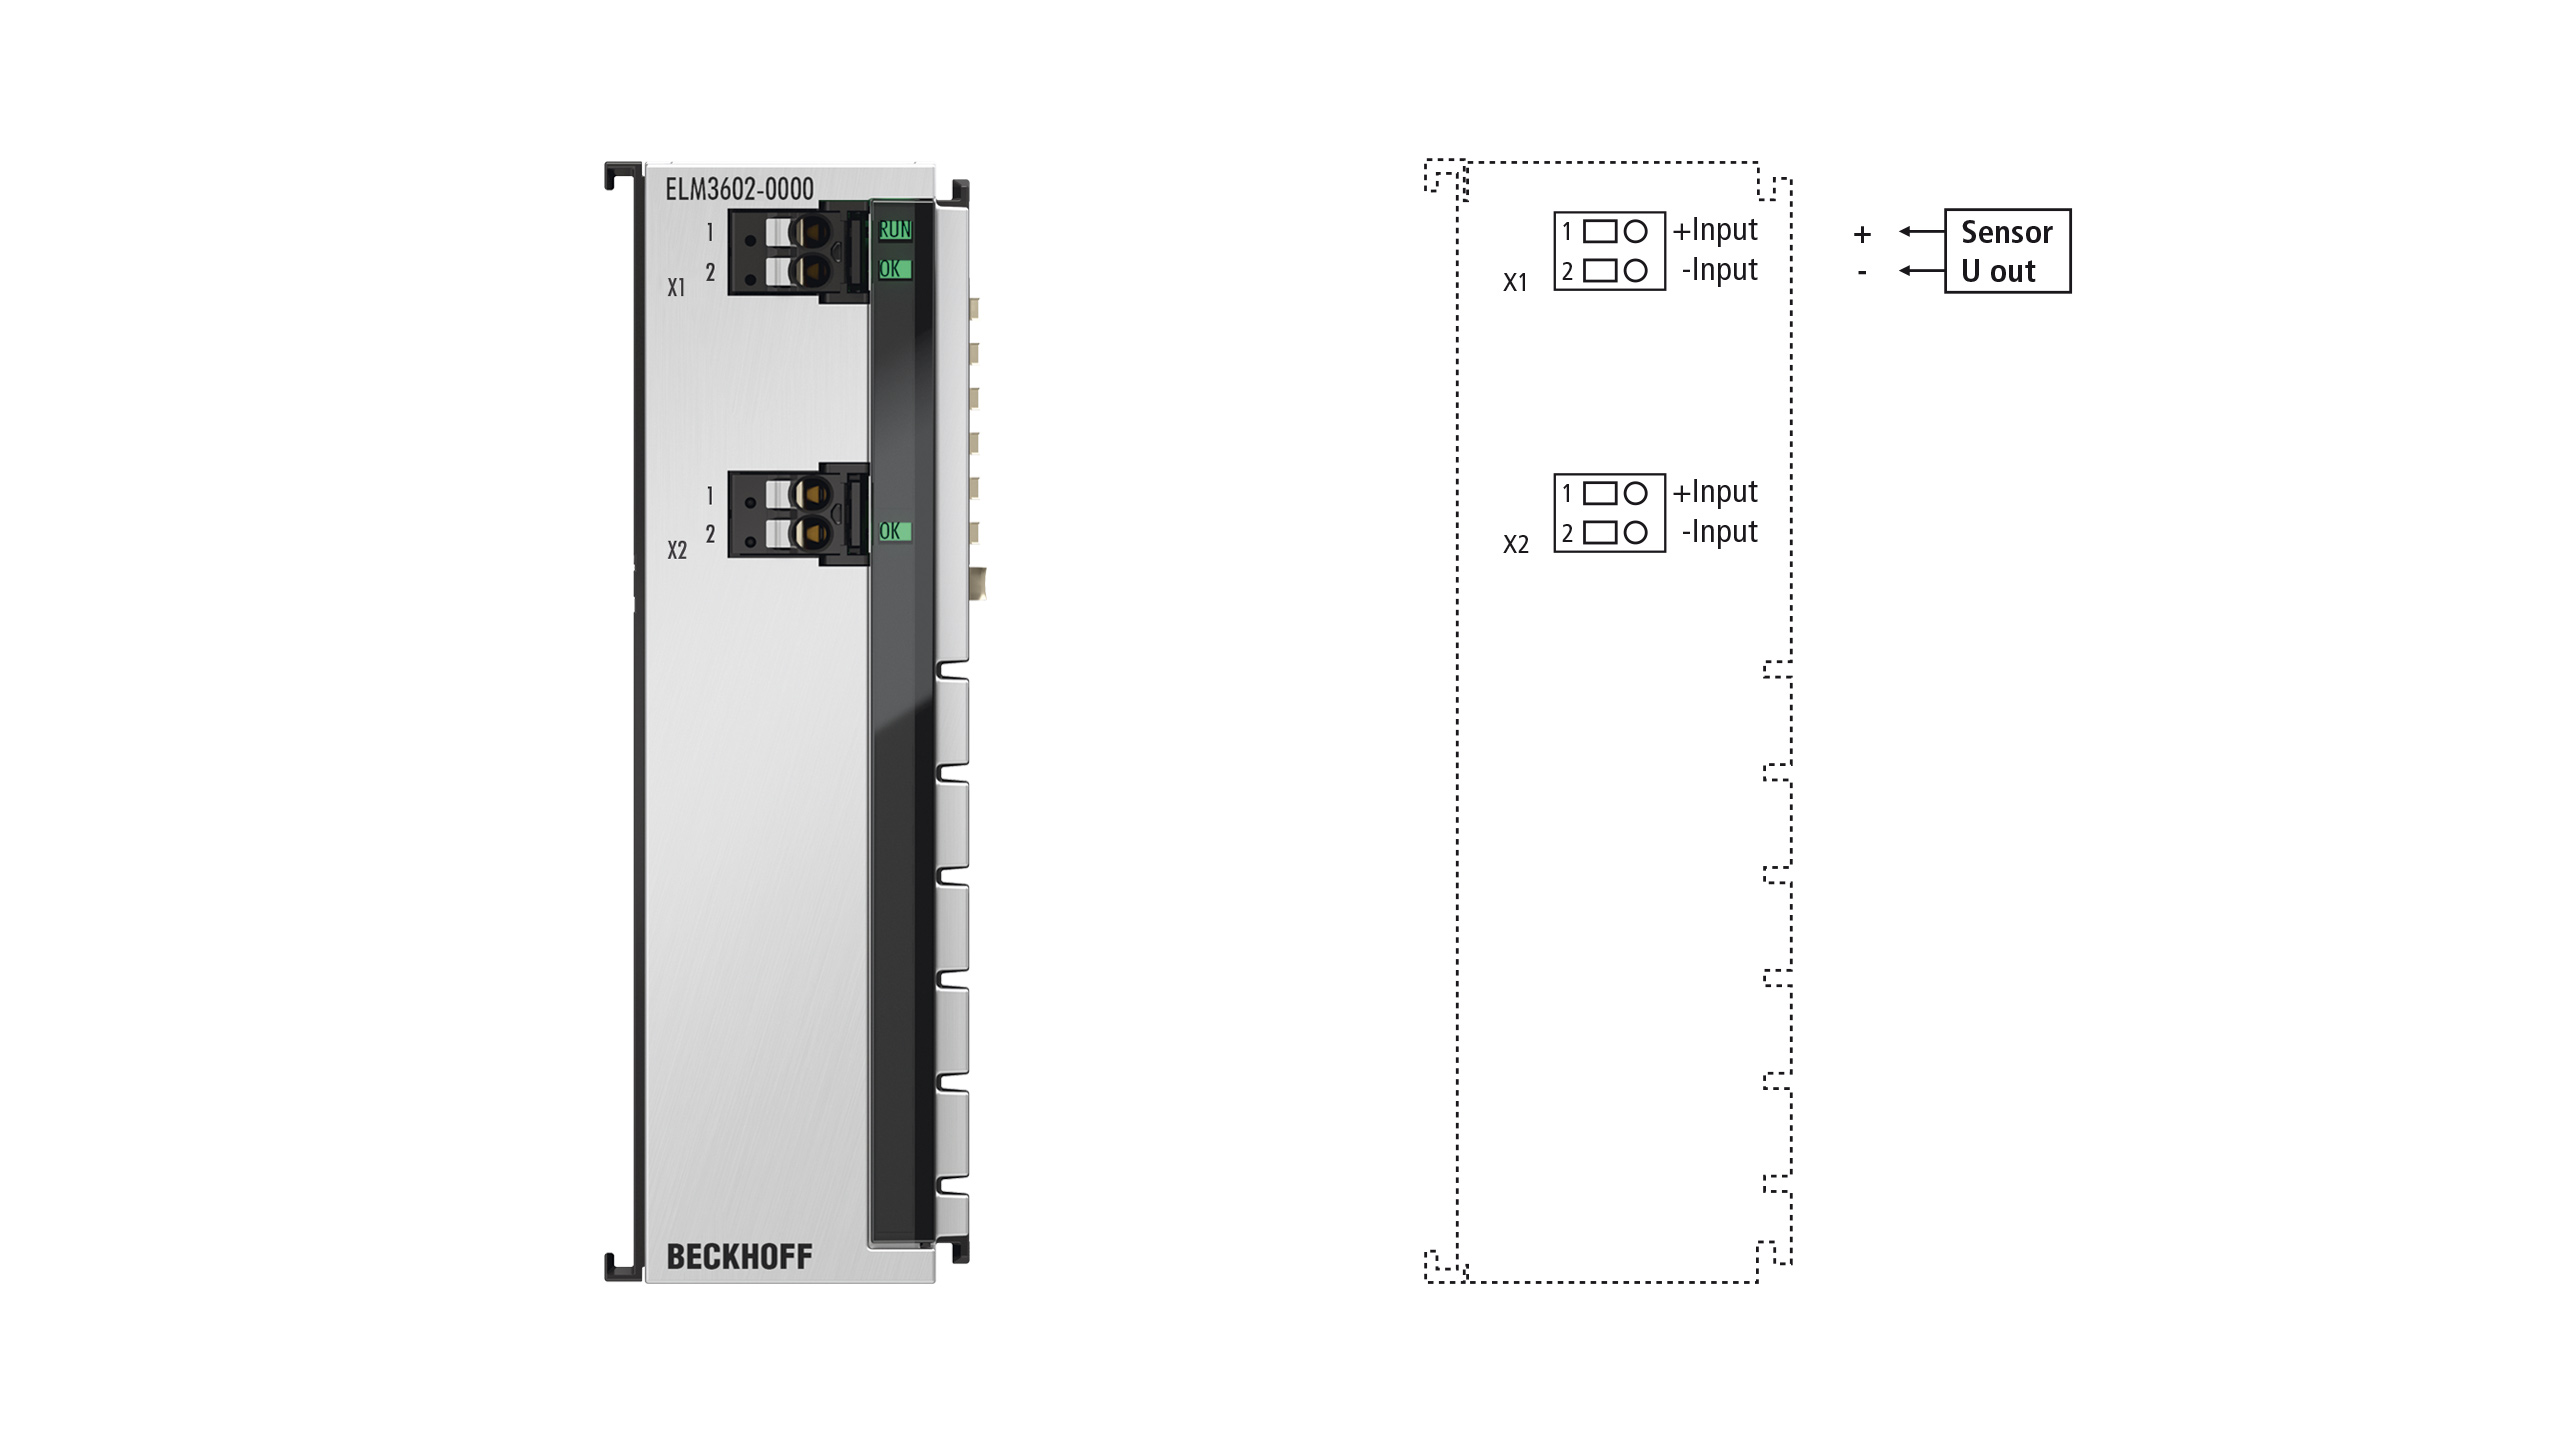 ELM3602-0000 | EtherCAT Terminal, 2-channel analog input, IEPE/accelerometer, 24bit, 50ksps